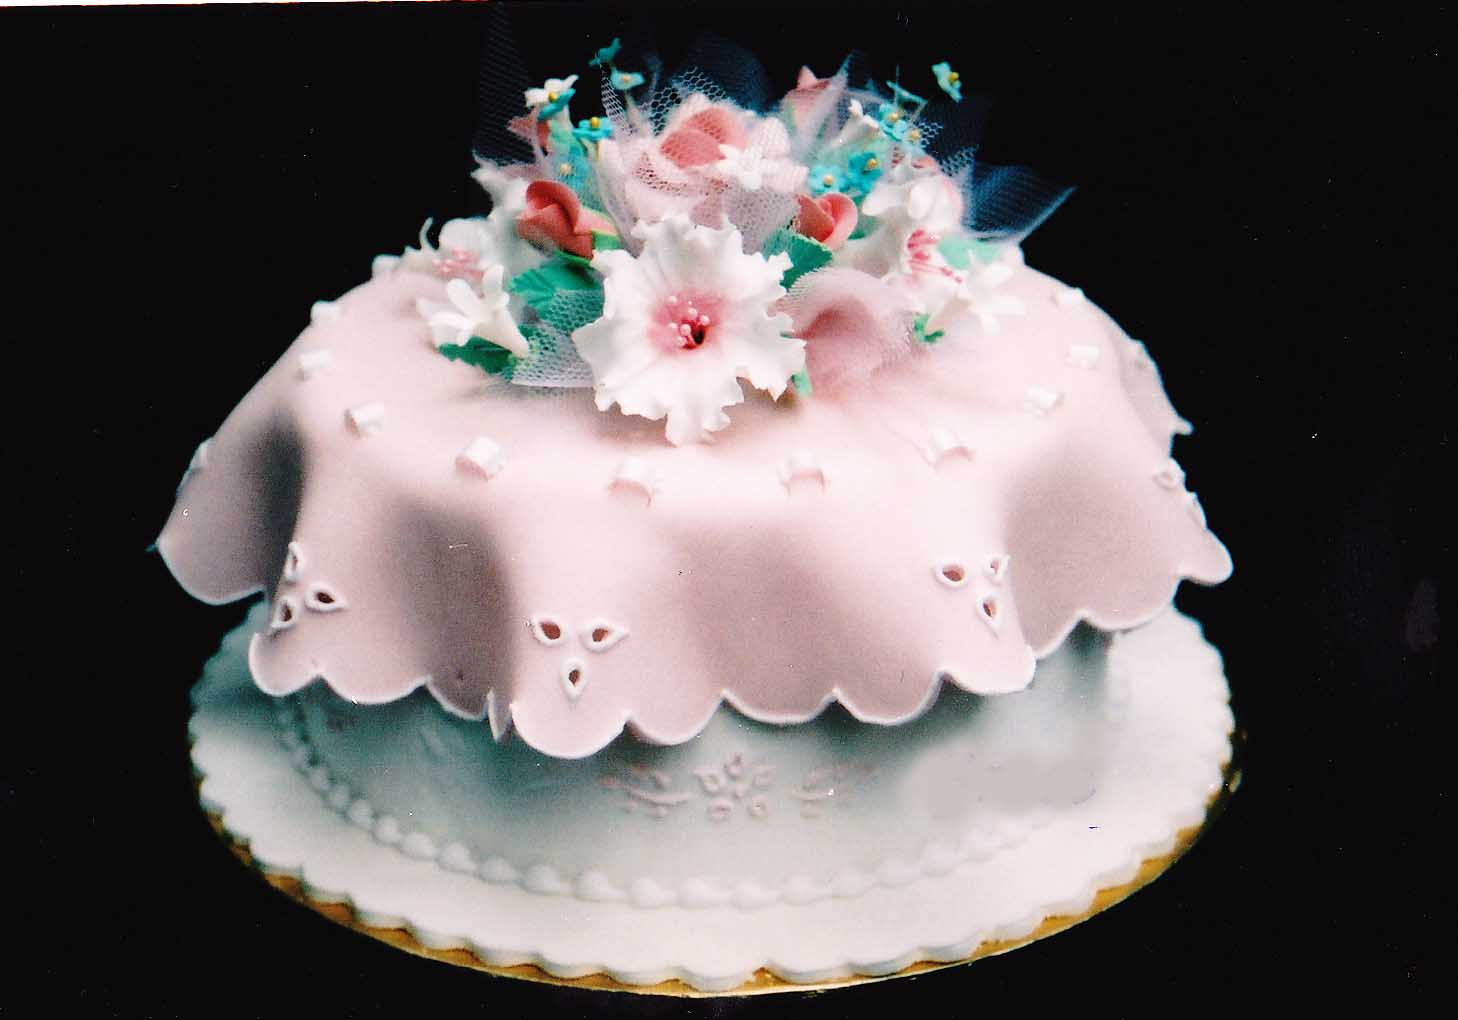 Images For Homemade Cake : Shanti s Homemade Cakes: Homemade Cakes